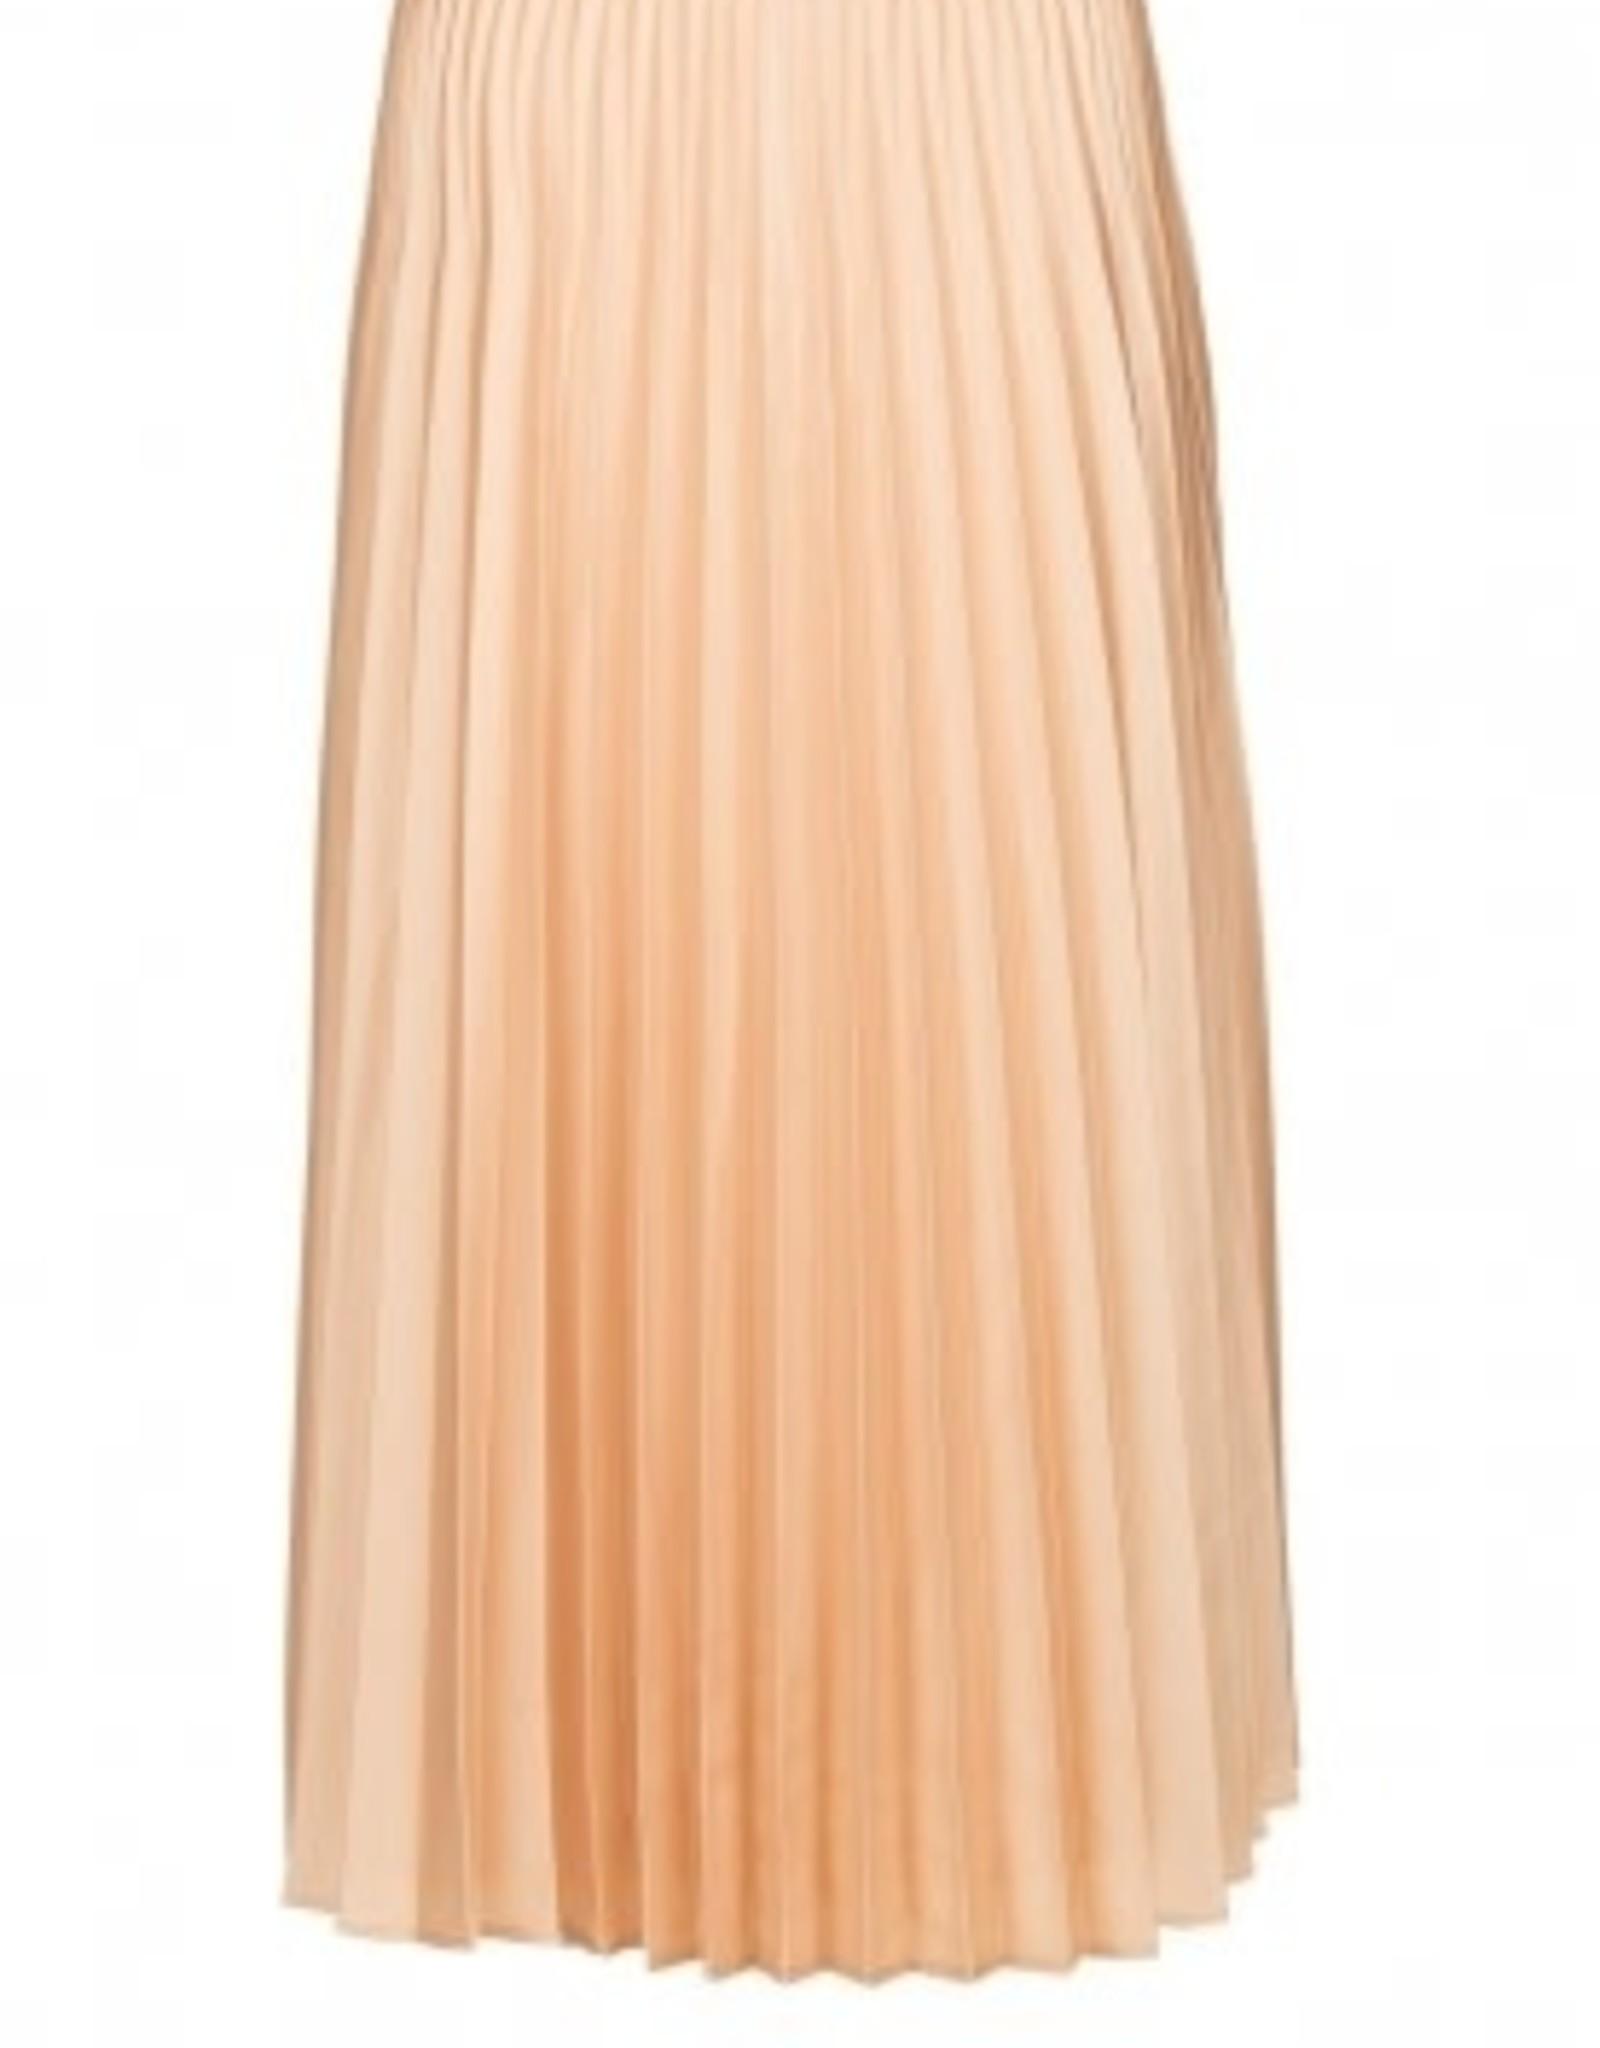 JcSophie Edinburgh Skirt Nude